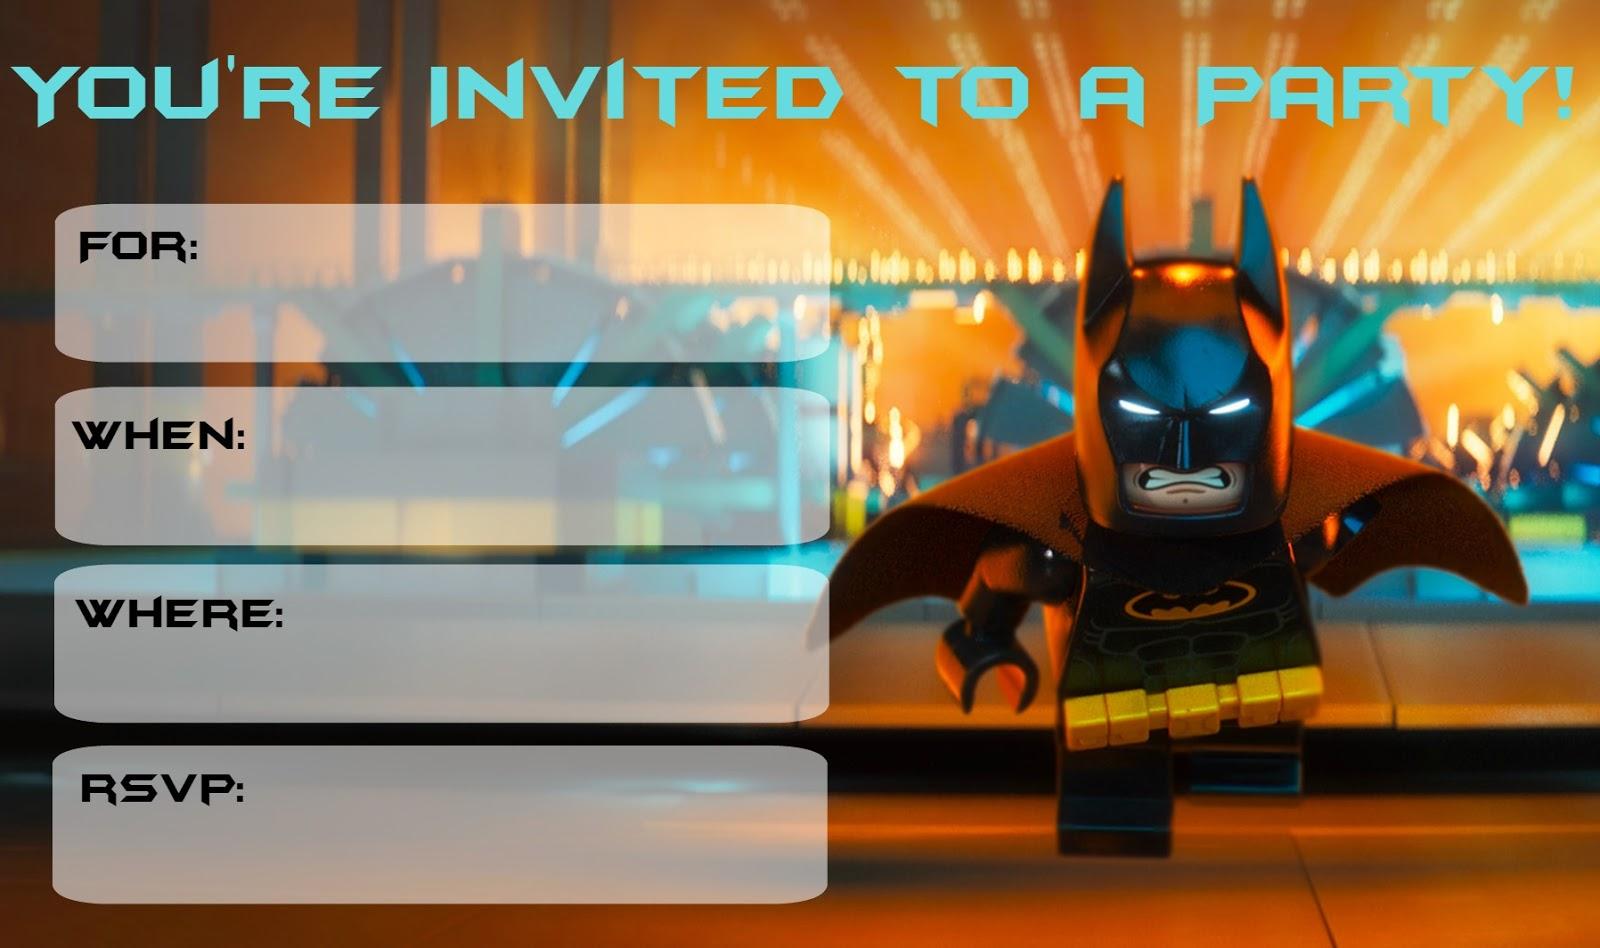 Lego Batman Binvitation Superb Lego Batman Party Invitations Free - Lego Batman Party Invitations Free Printable